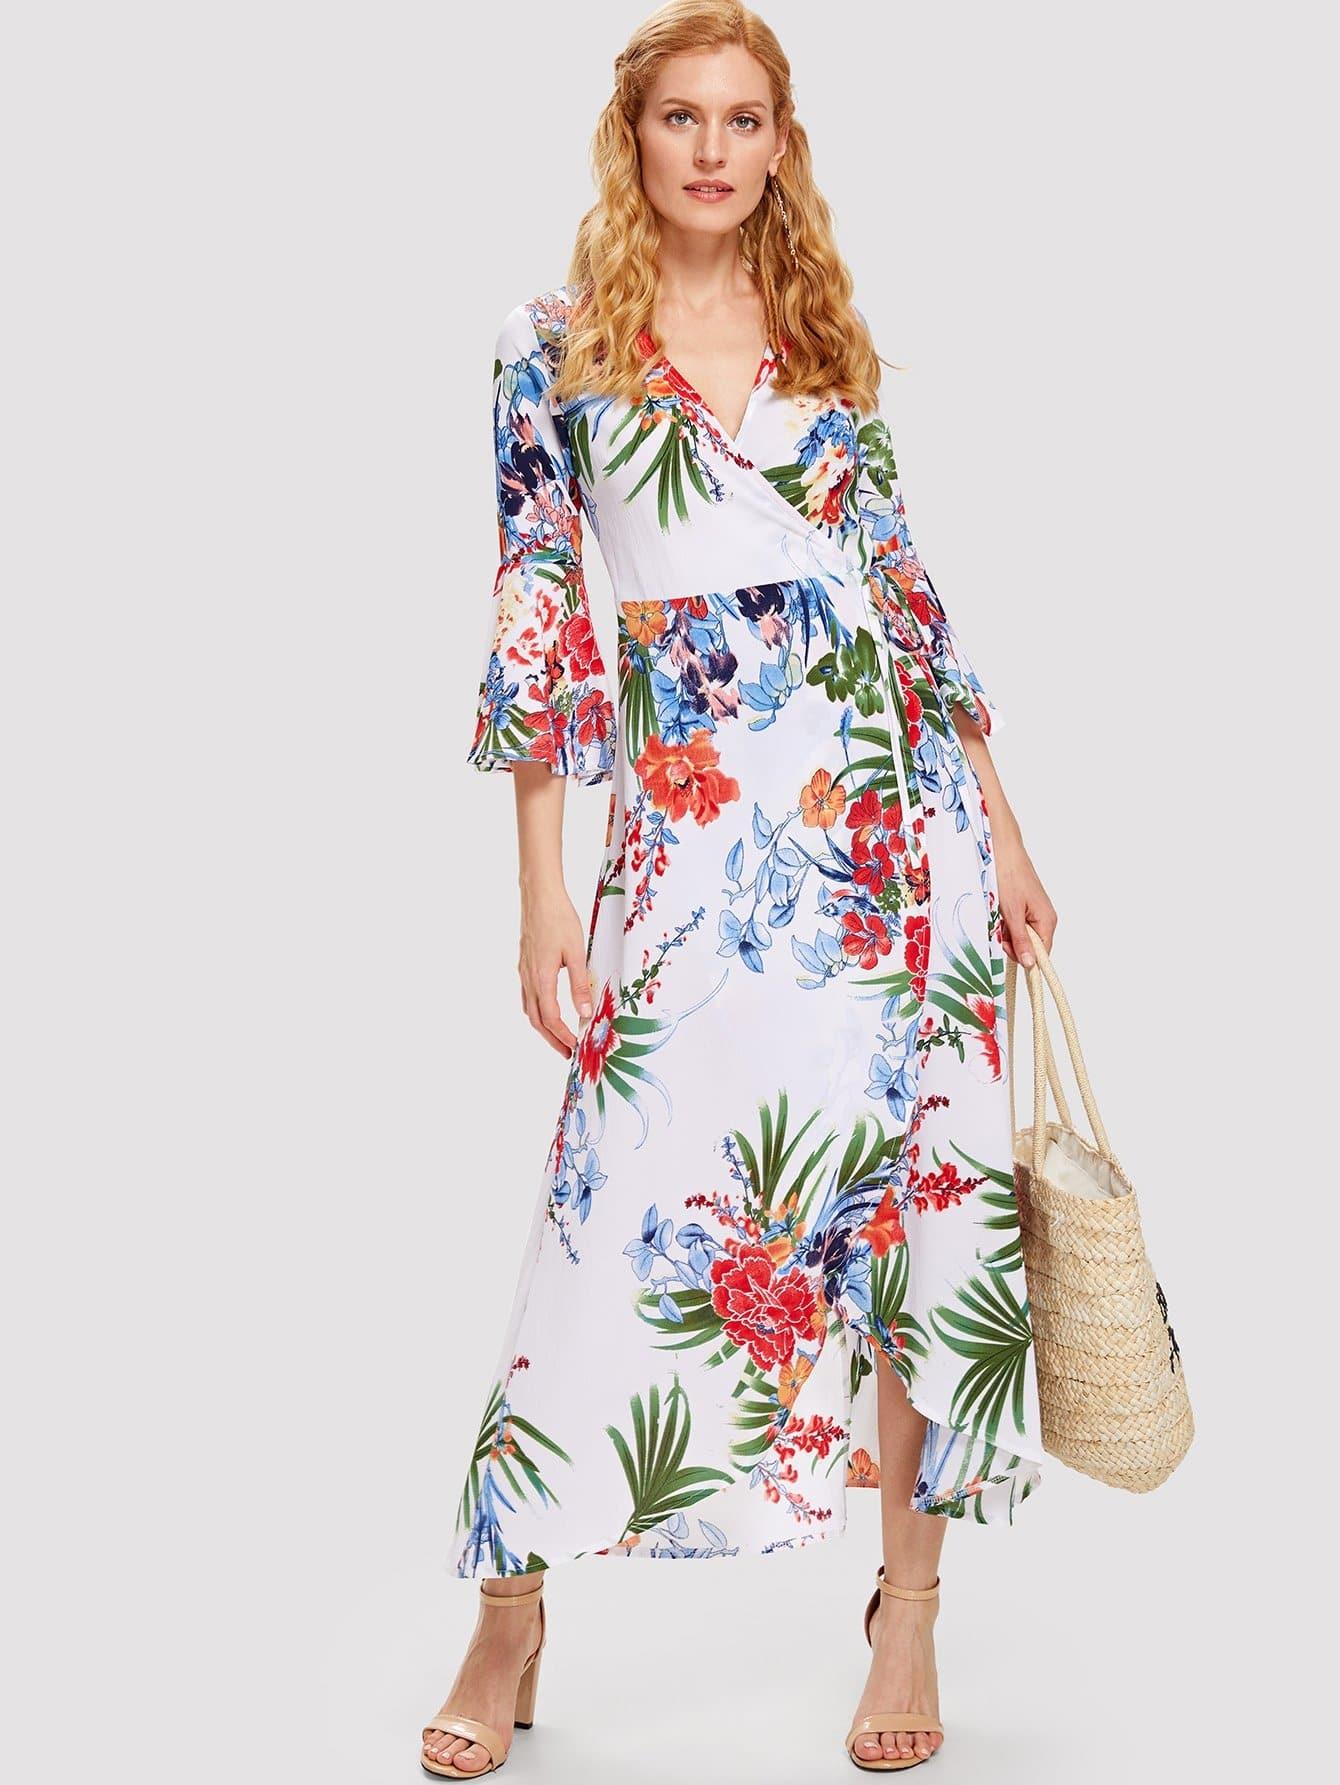 Botanical Print Flounce Sleeve Wrap Dress trumpet sleeve botanical print dress